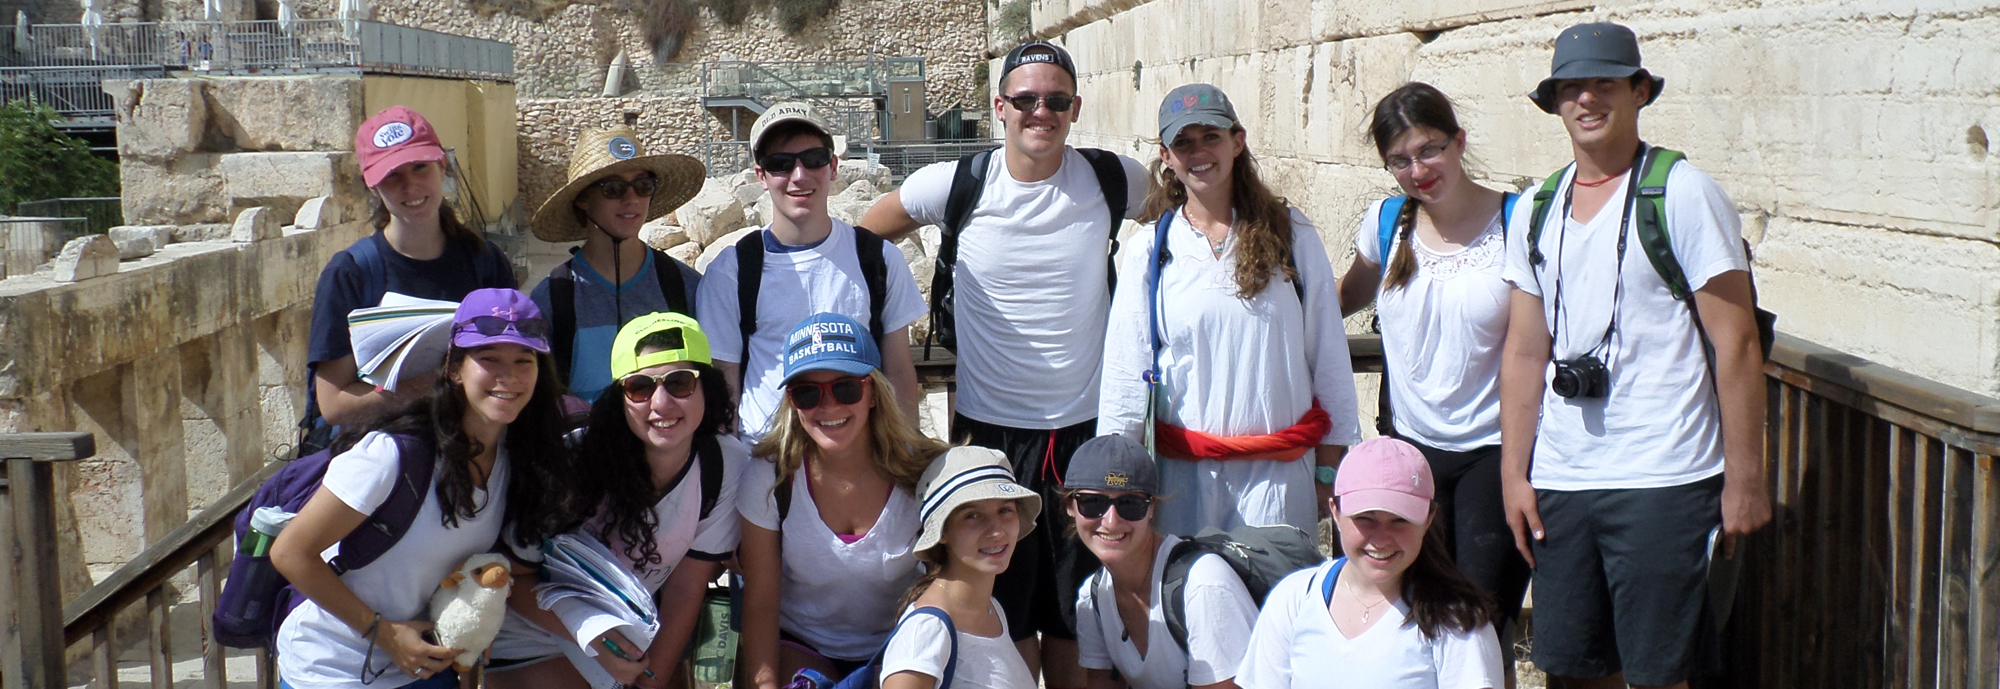 Summer Program - Jewish Culture | URJ Heller High